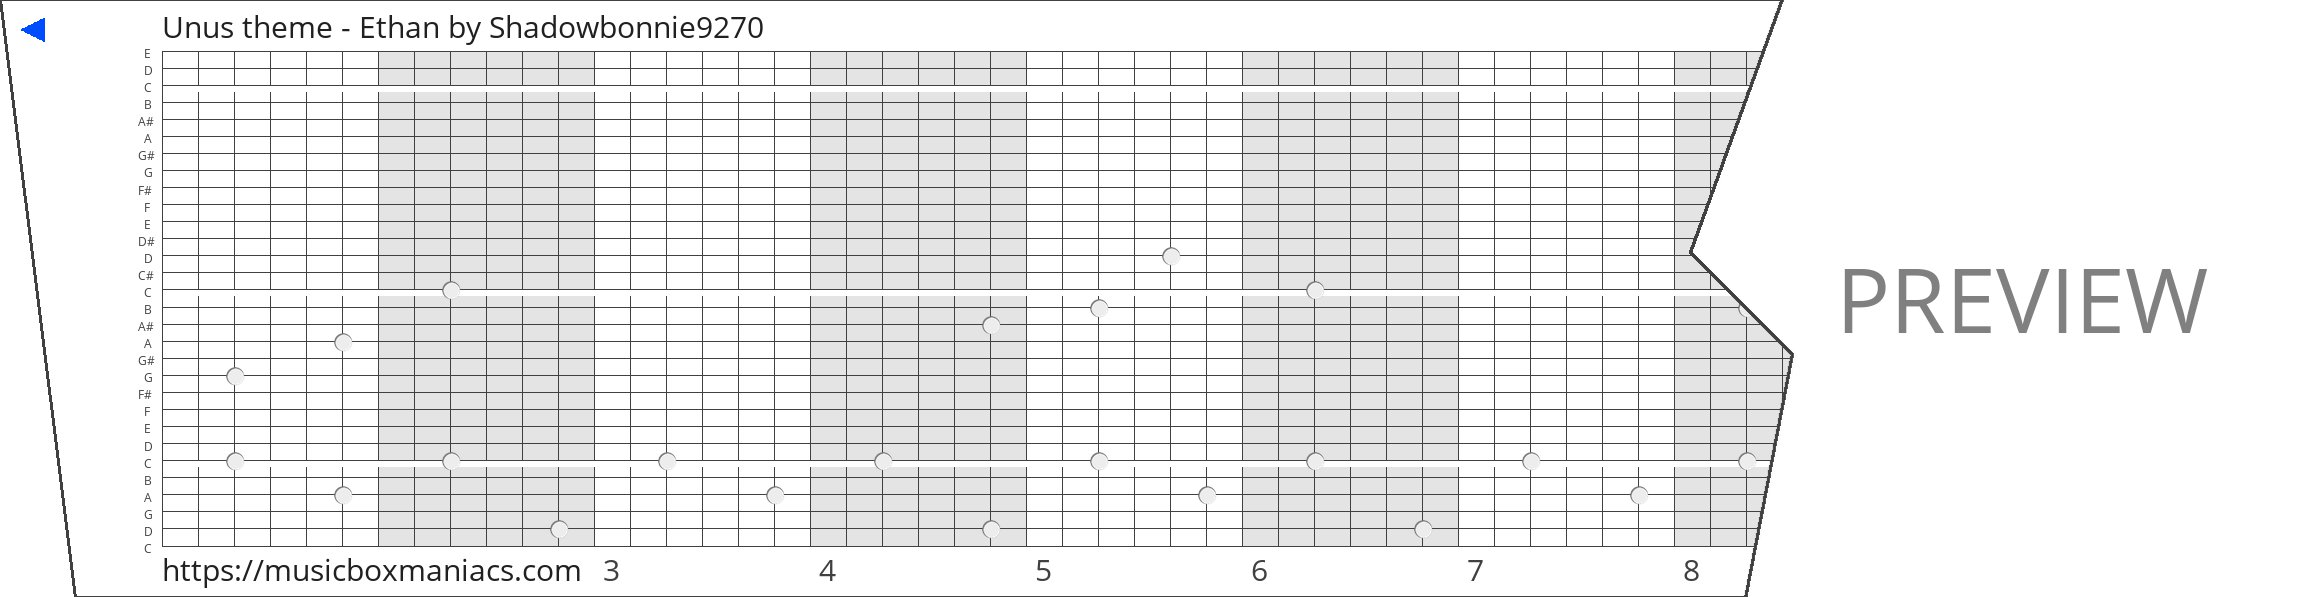 Unus theme - Ethan 30 note music box paper strip